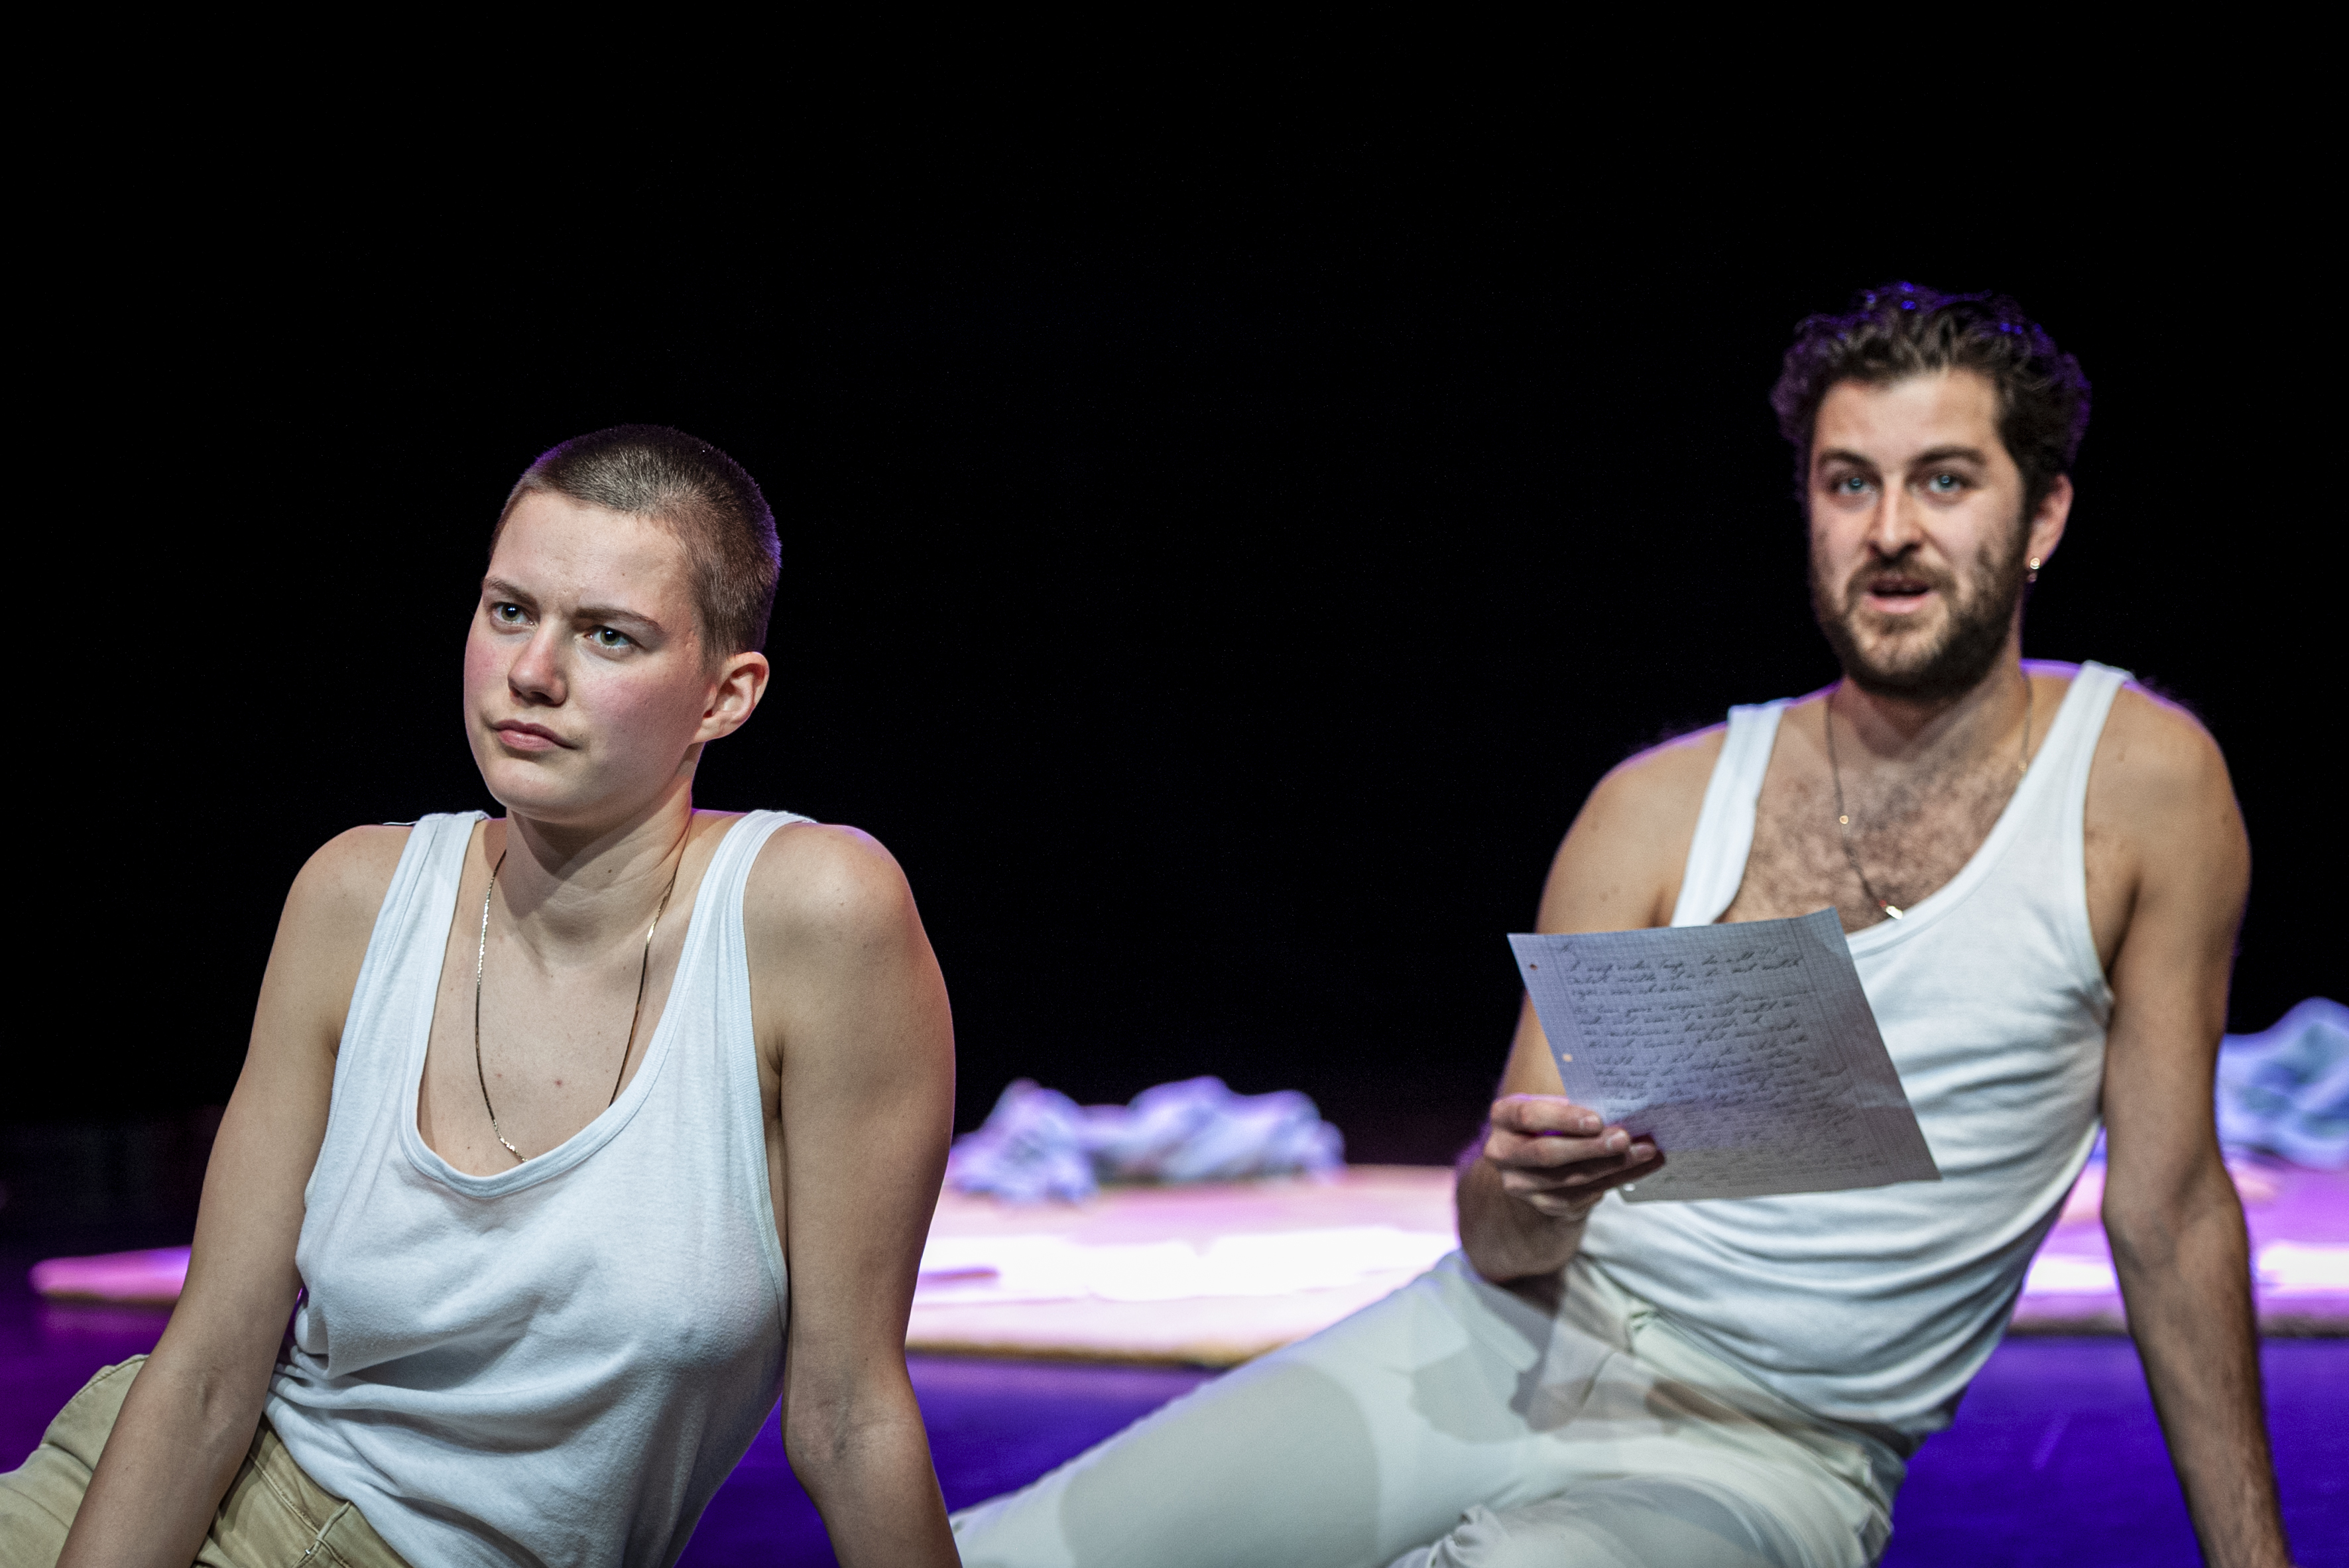 Dirty Debüt S2#8-romantic comedy | #beginnings by Onur Ağbaba & Lotta Becker | Photo © Anna Agliardi